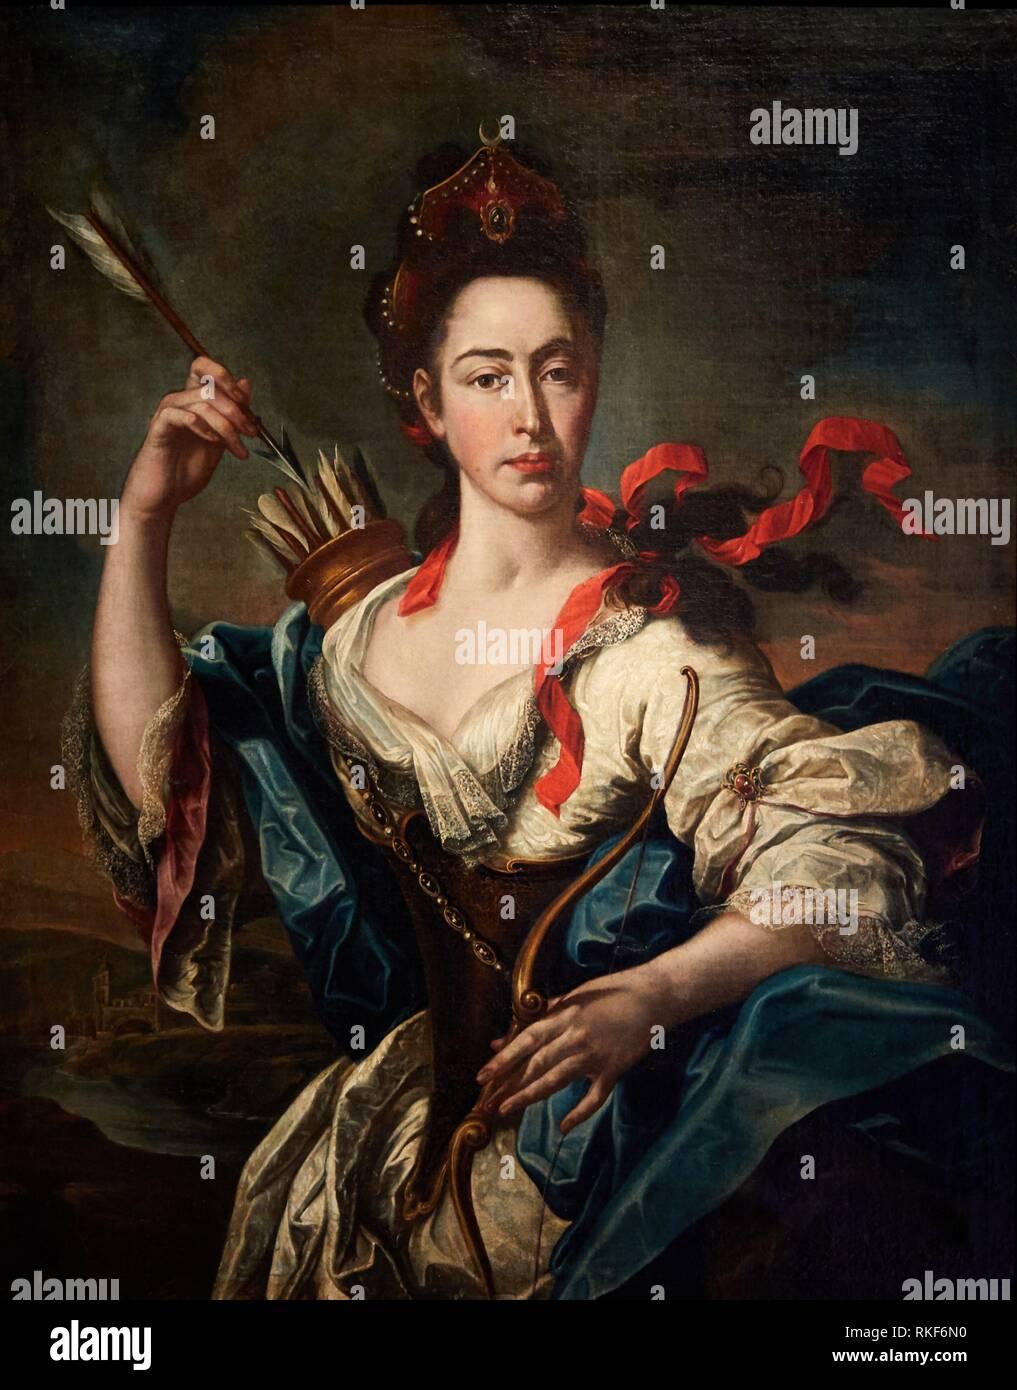 '''Portrait of a Woman with Attributes of Diana'', 1725, Pere Crusells, National Museum of Catalan Art, Museu Nacional d Art de Catalunya, MNAC, - Stock Image